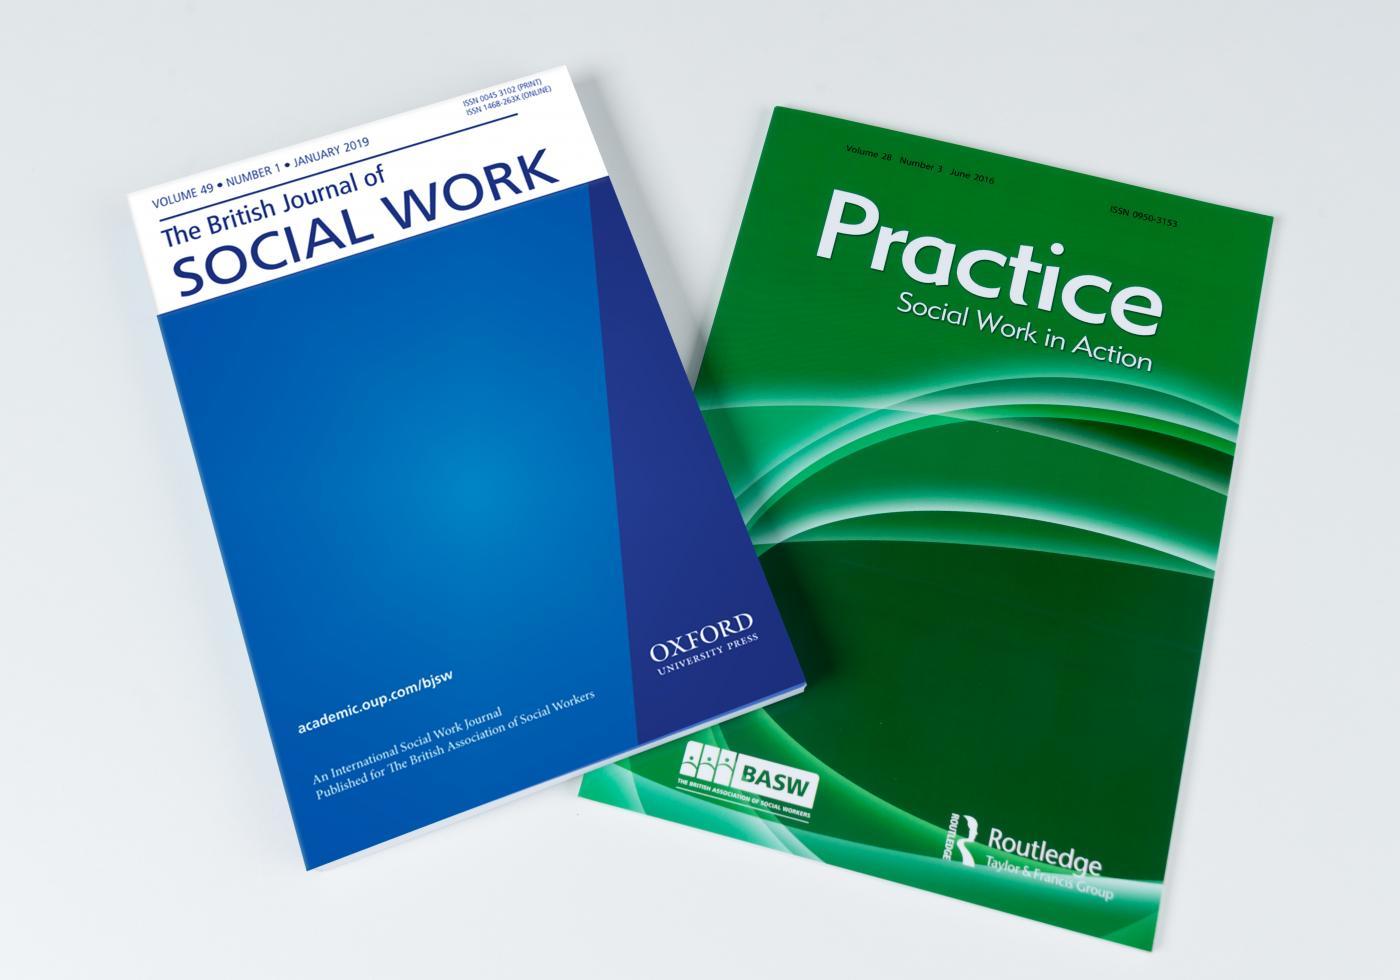 British Journal of Social Work & Practice - Social Work in Action 2019